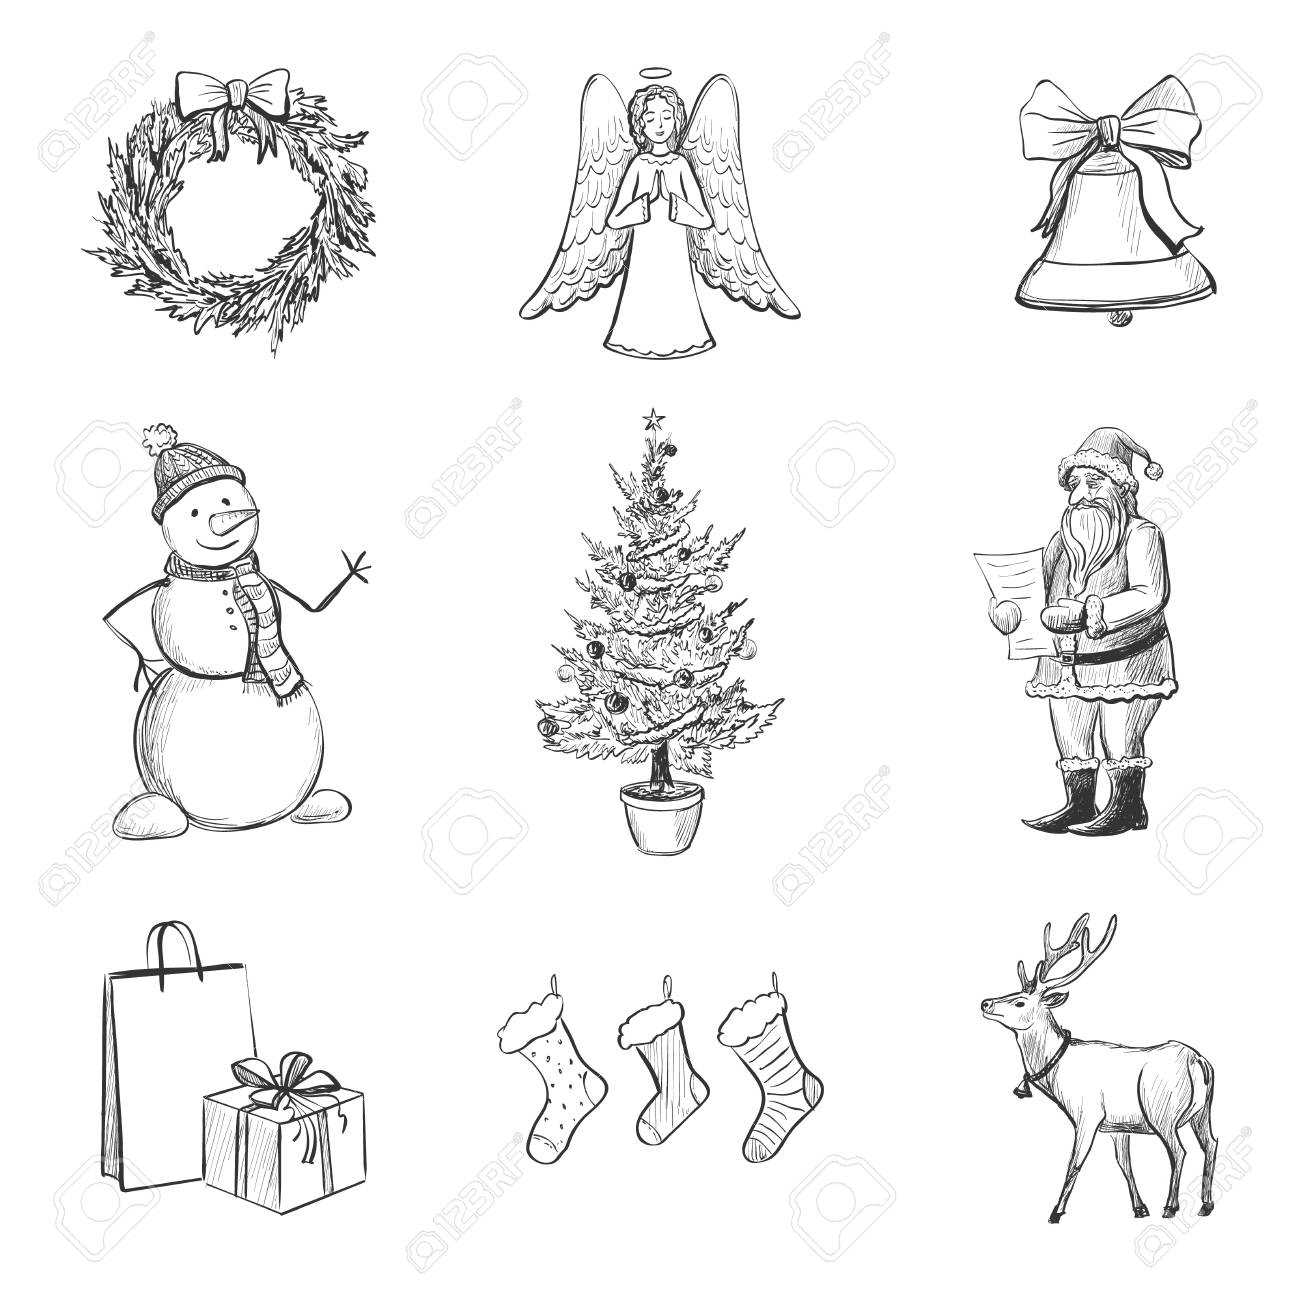 Christmas Sketches.A Vector Set Of Nine Christmas Sketches Characters Symbols